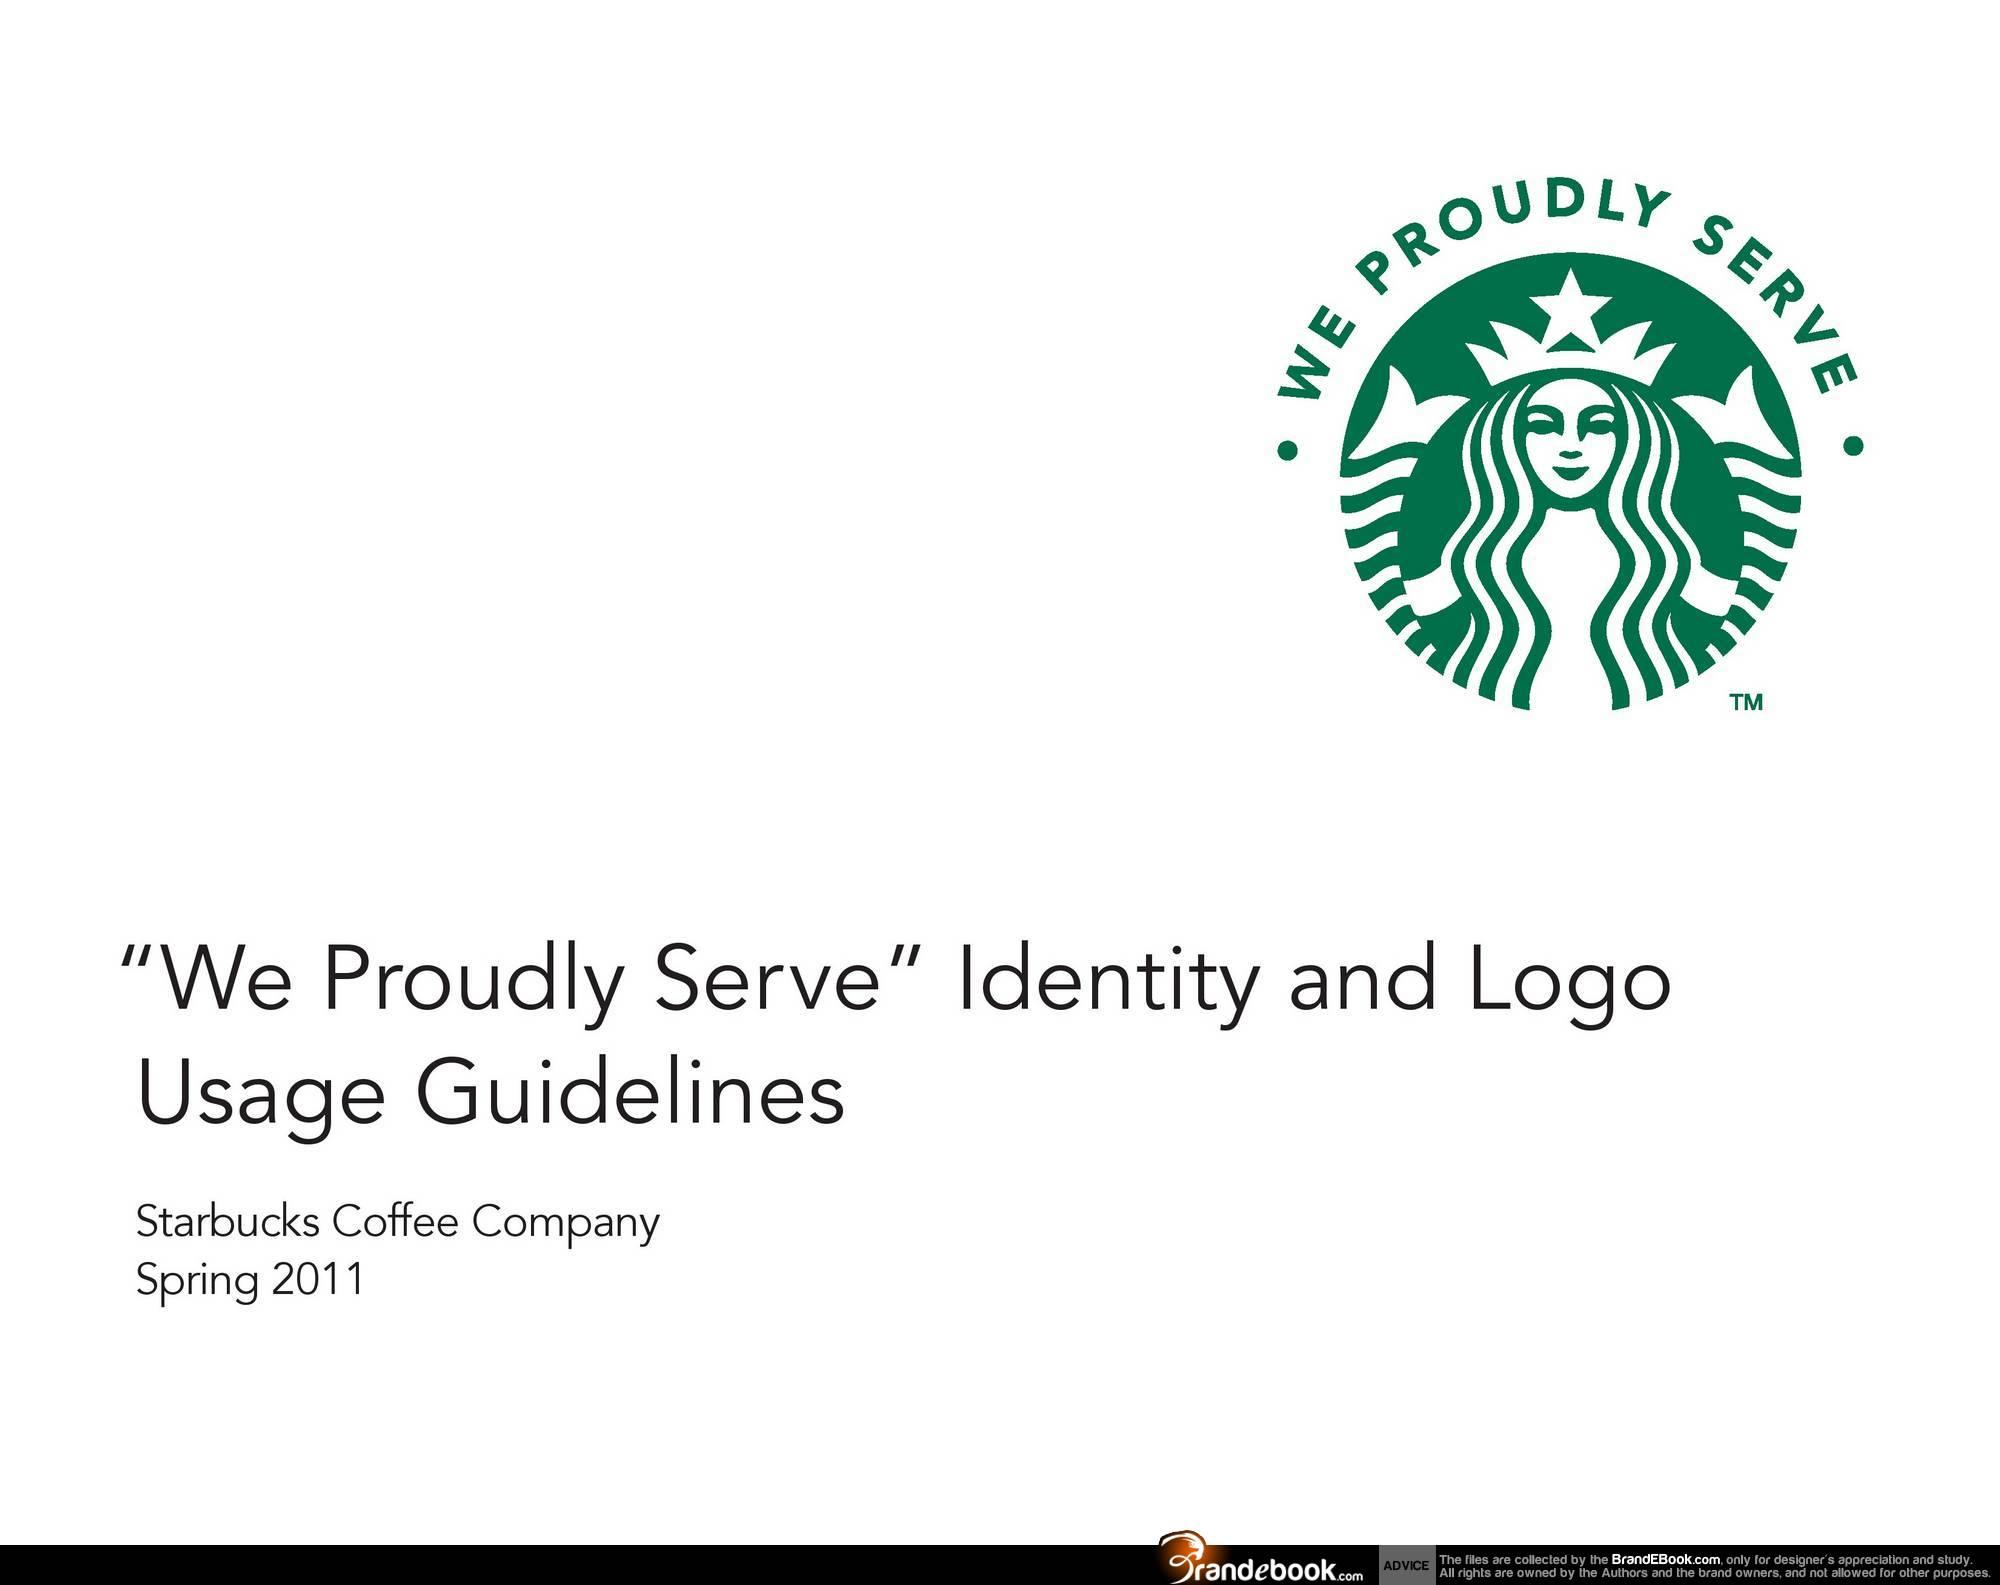 Starbucks coffee – branding style guides.